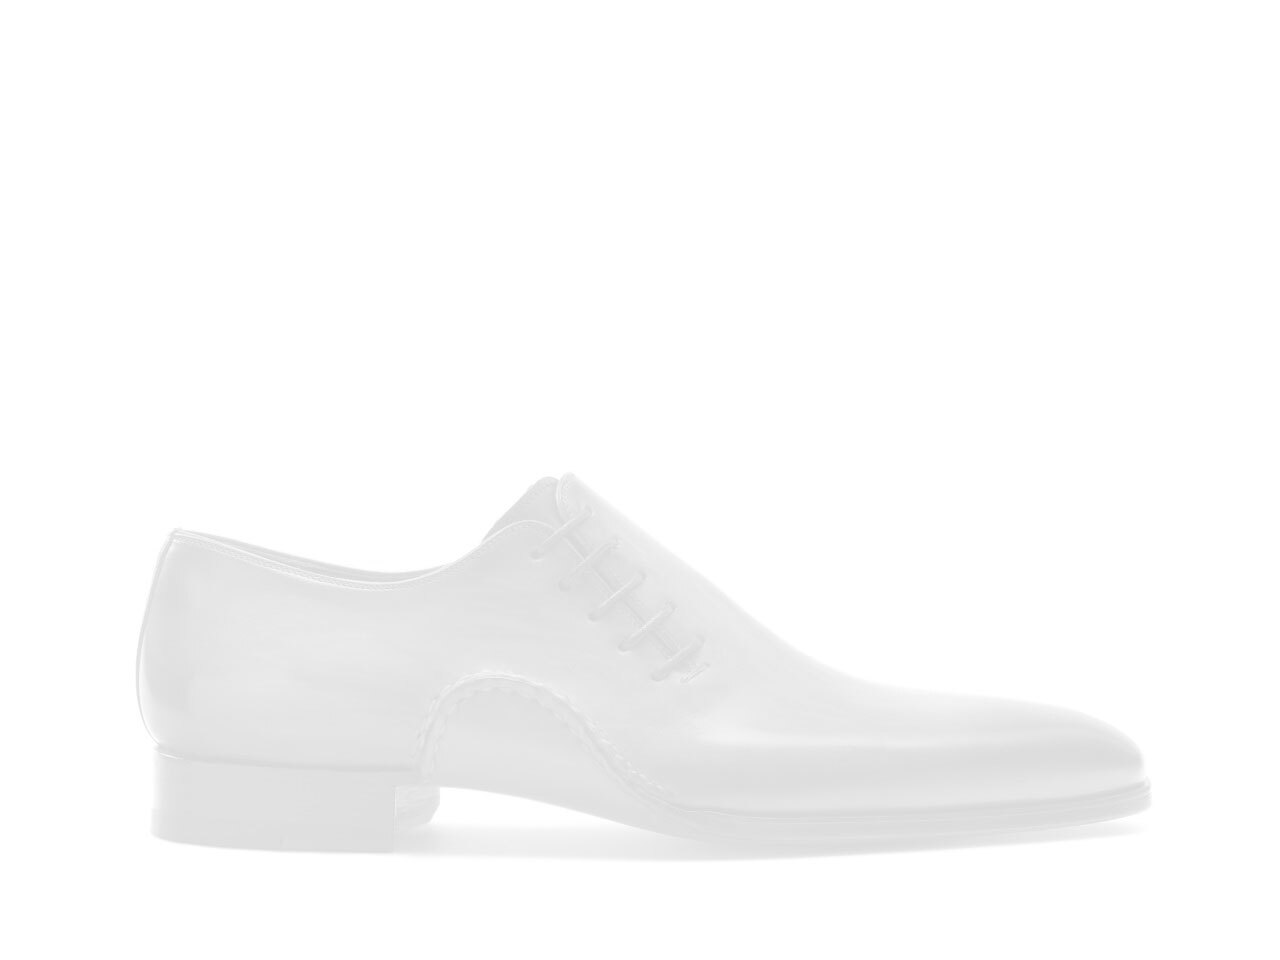 023950ff664 Cuero brown alligator leather shoes for men - Magnanni